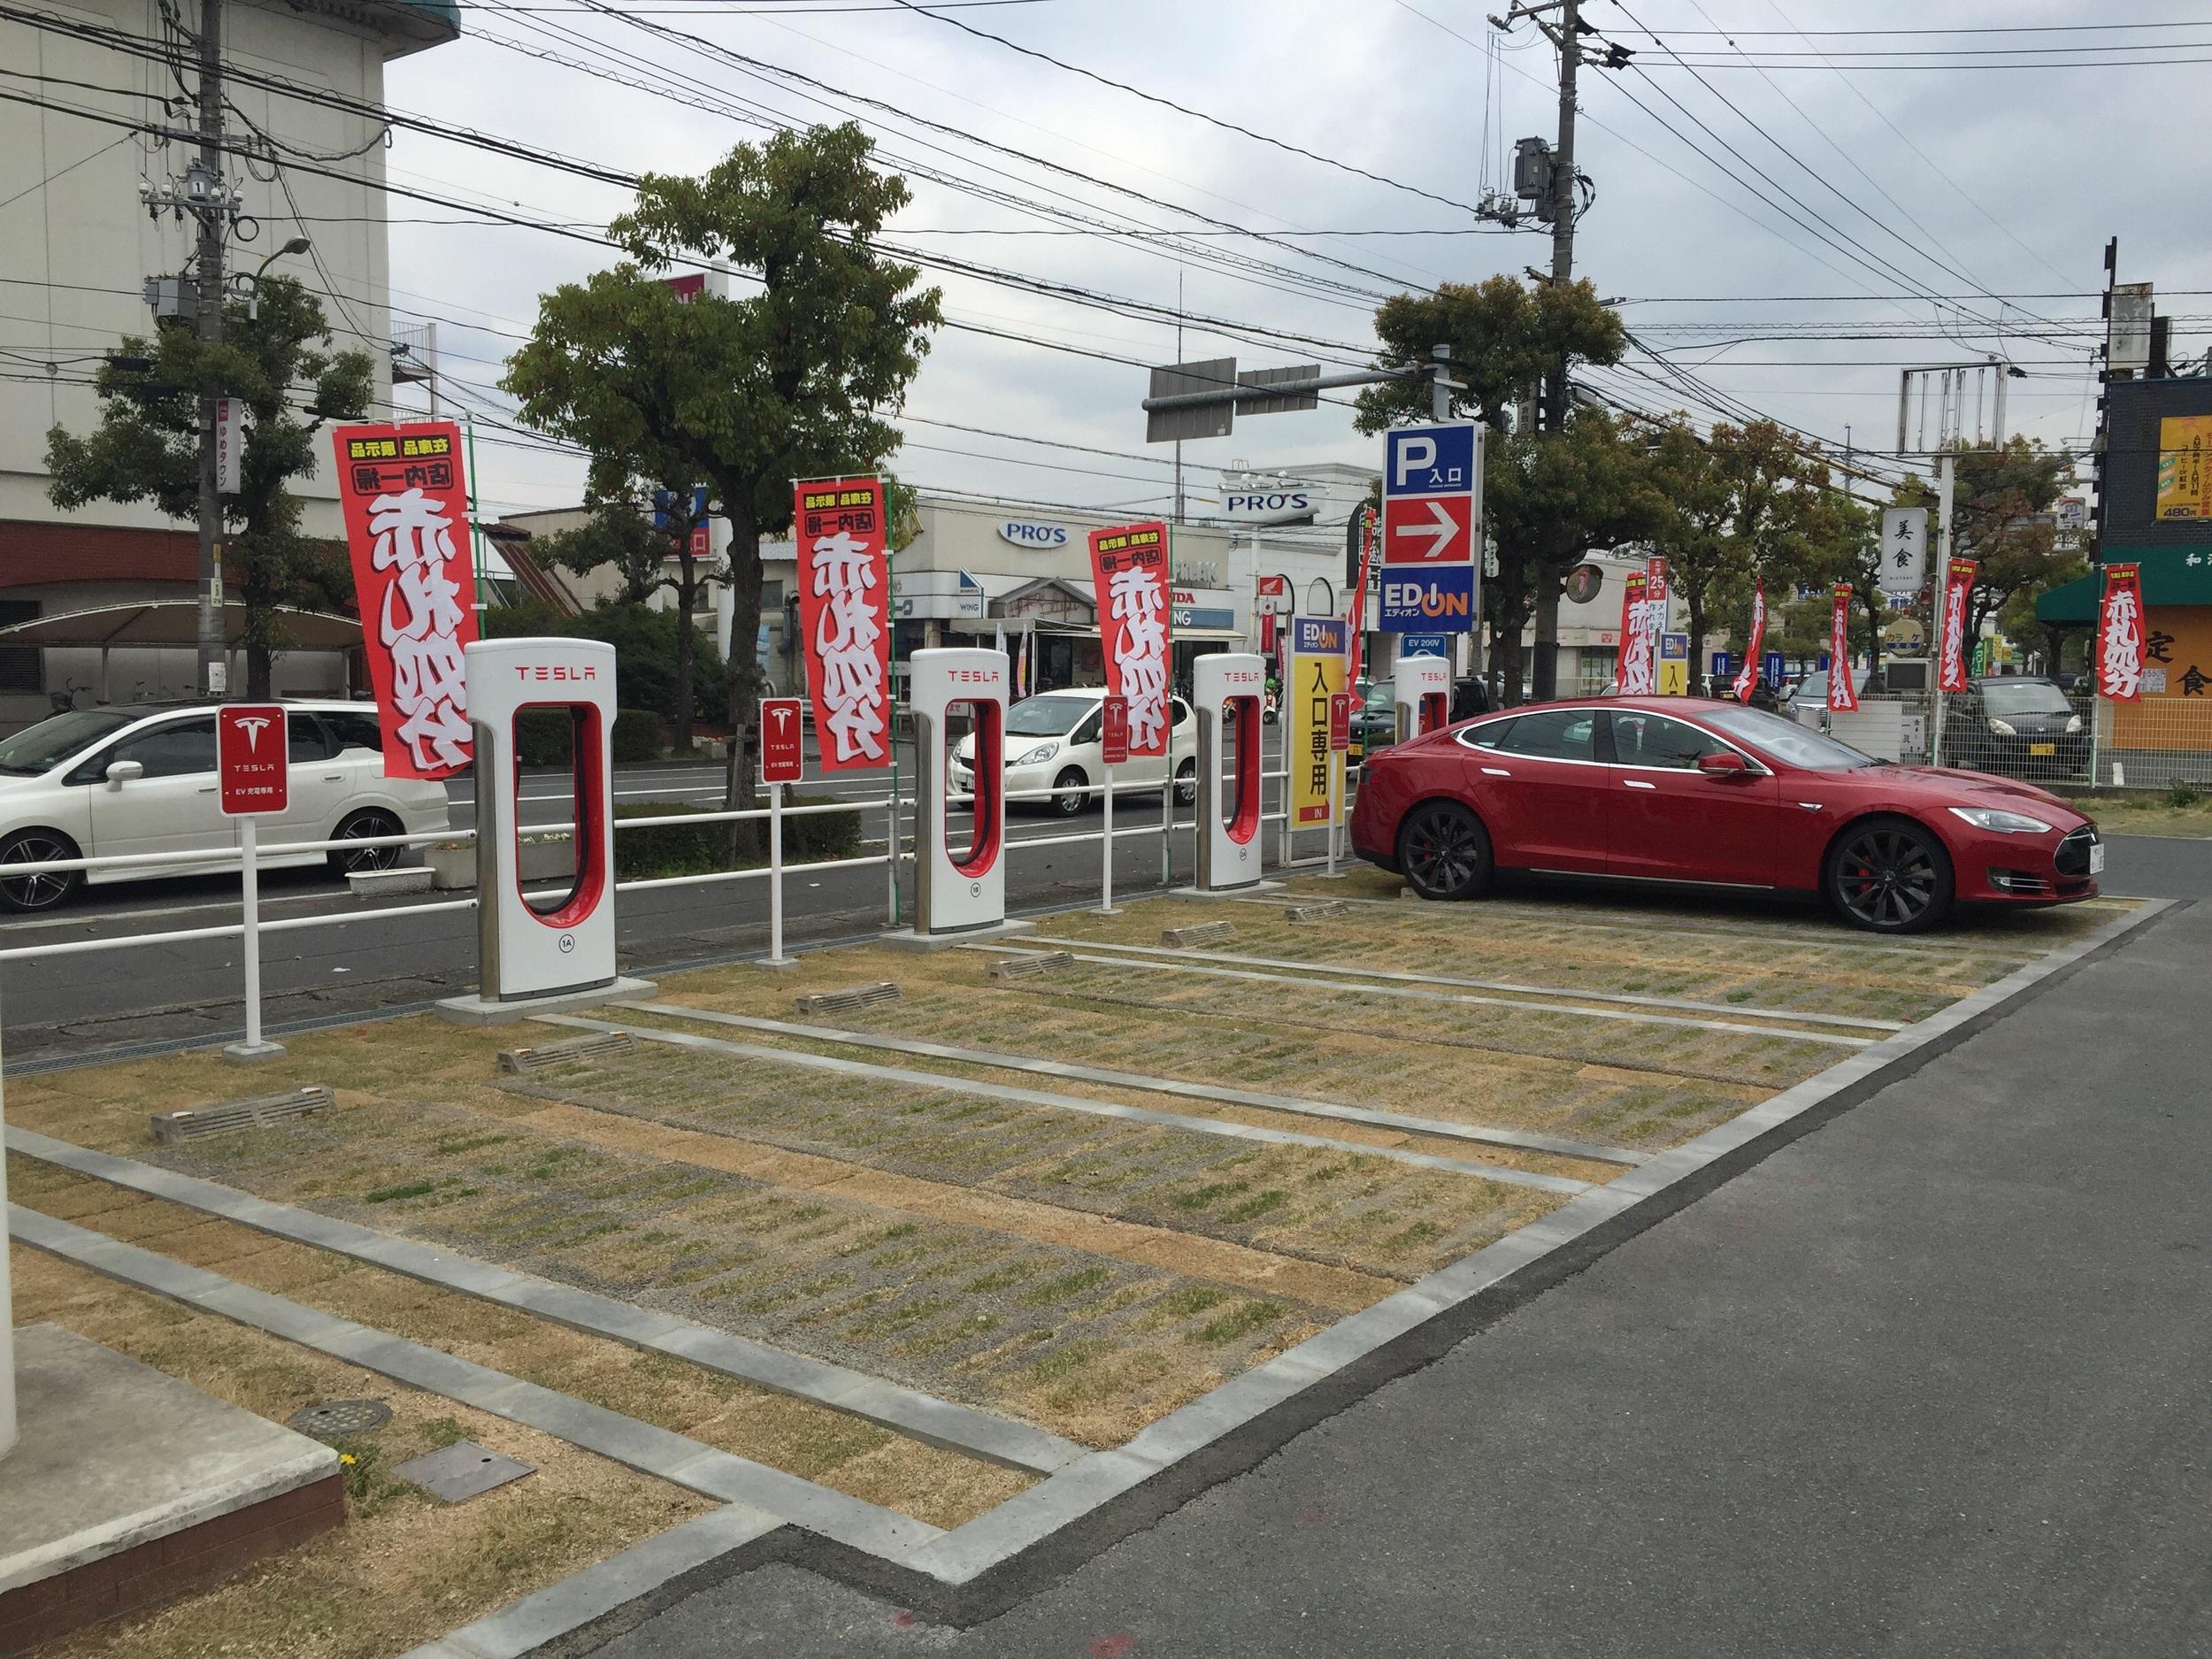 The Kurashiki Supercharger has four chargers